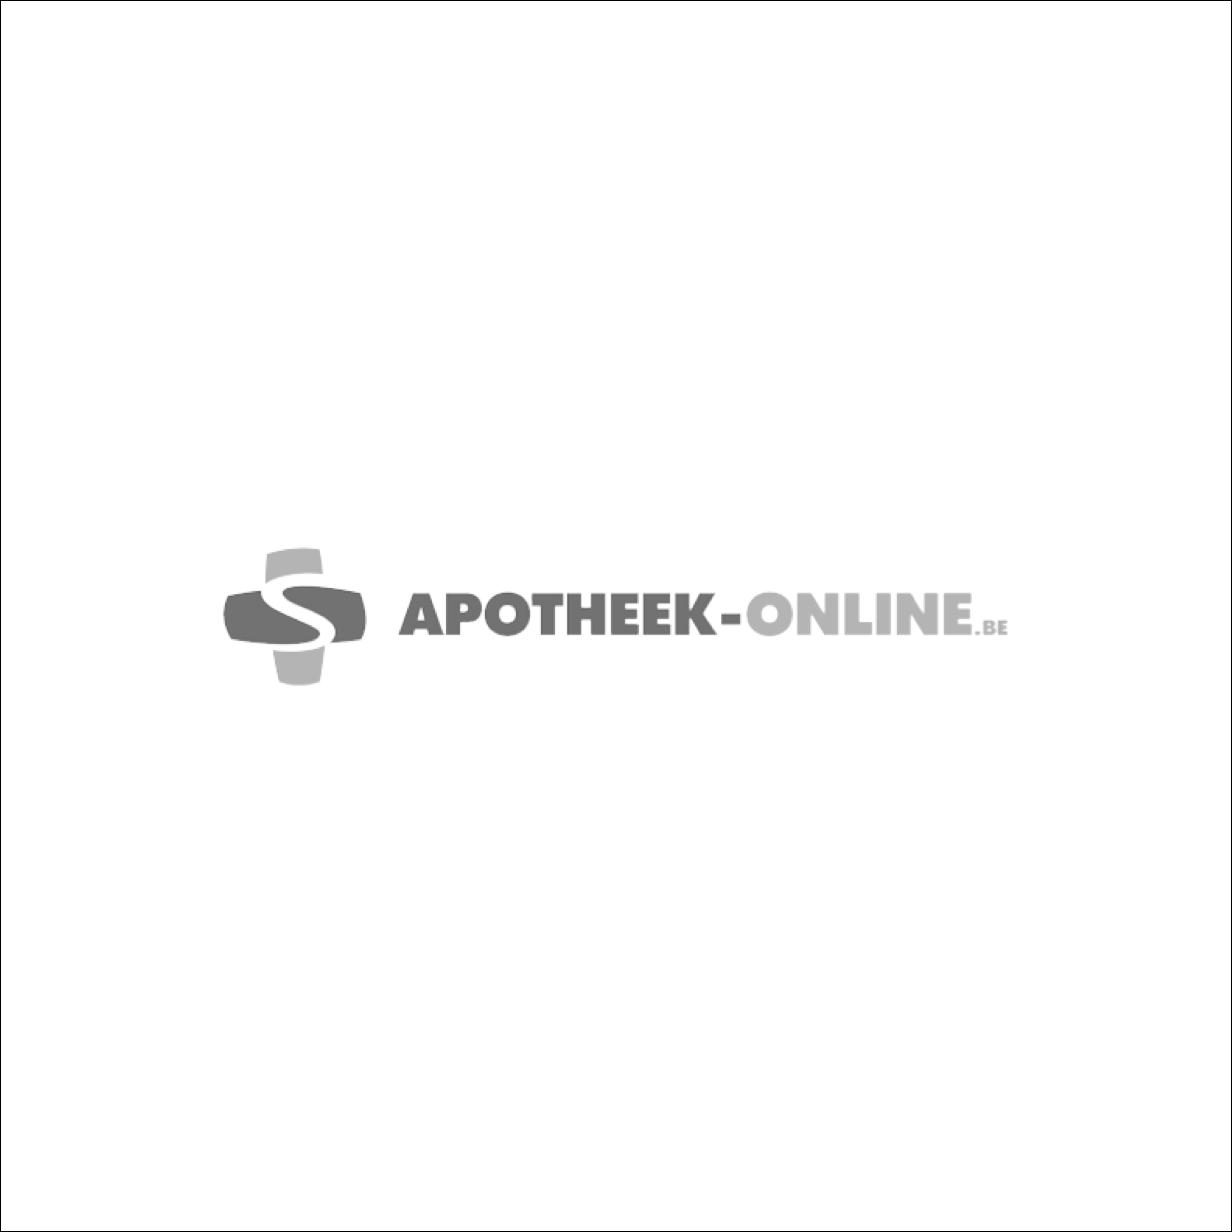 EYCOPAD HARTM KP STER 70X85MM 25 4175403